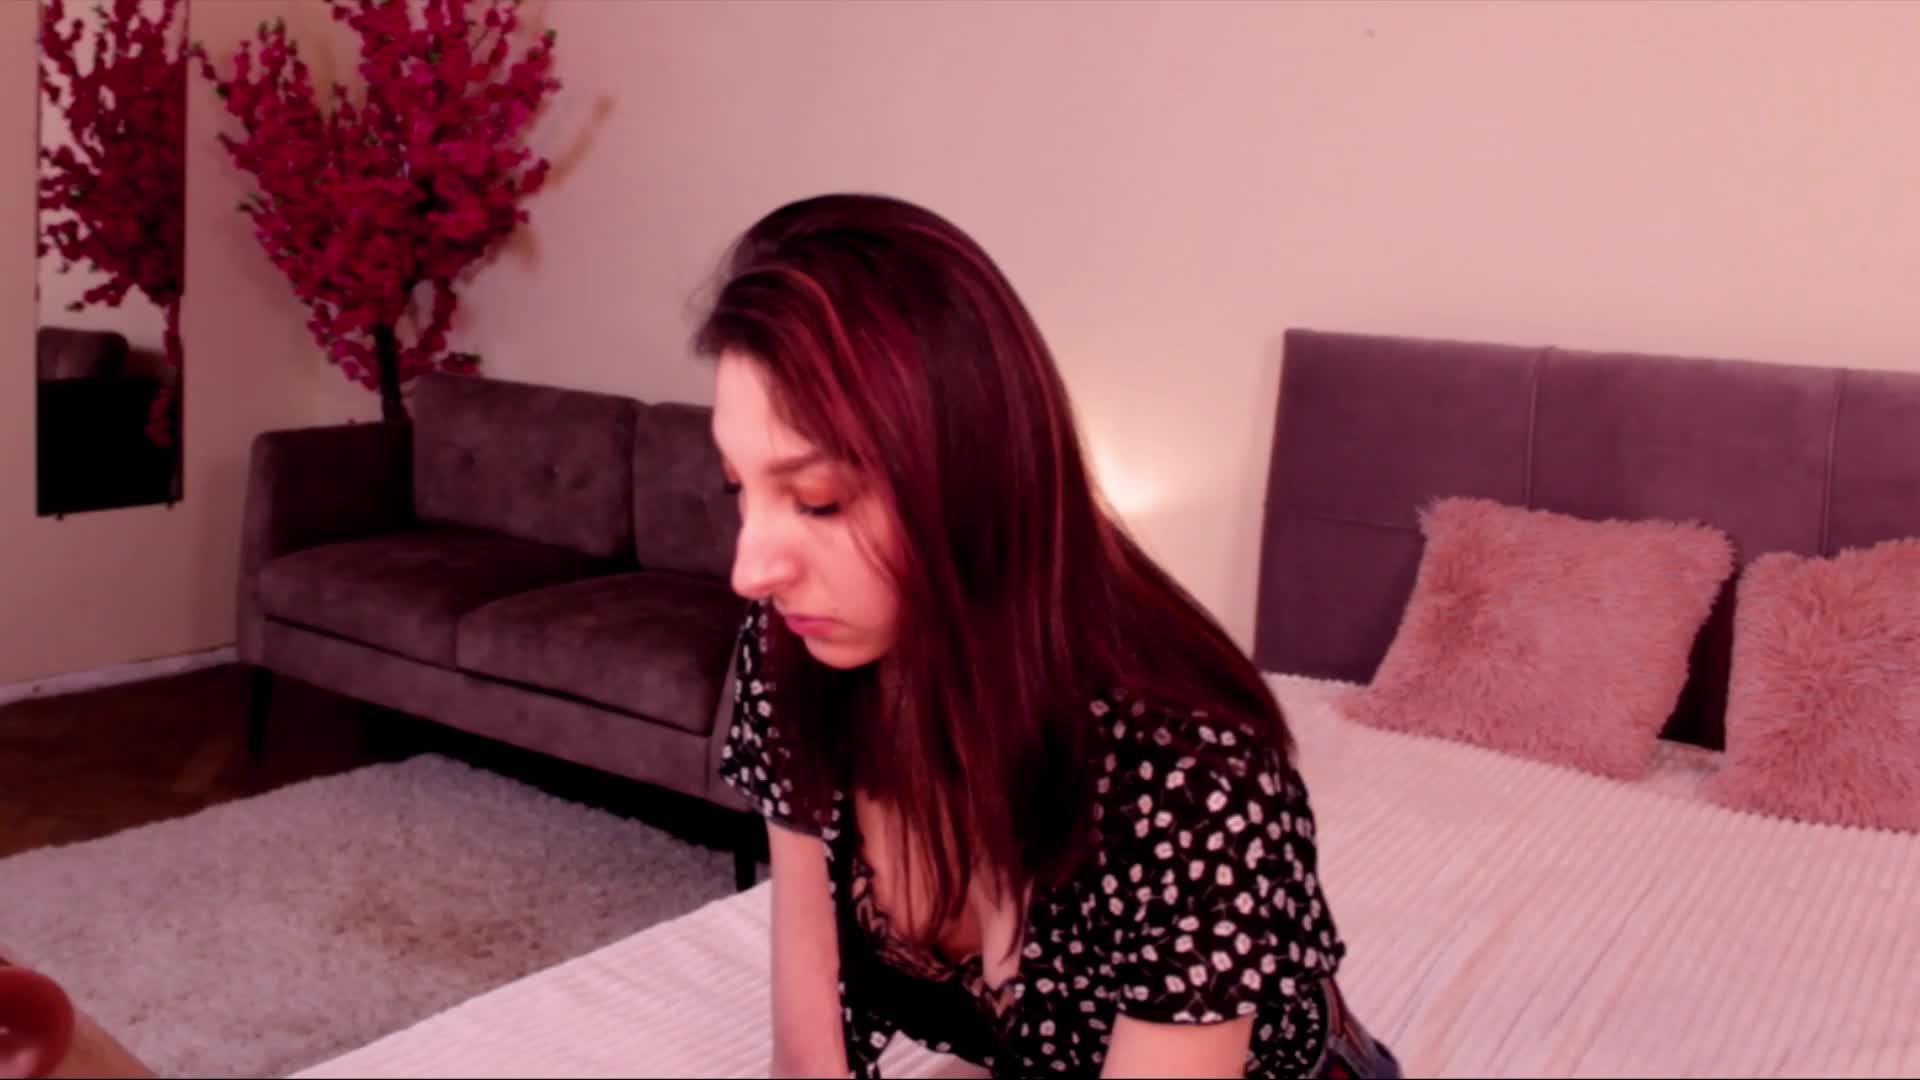 Jasmine_cute cam pics and nude photos 6